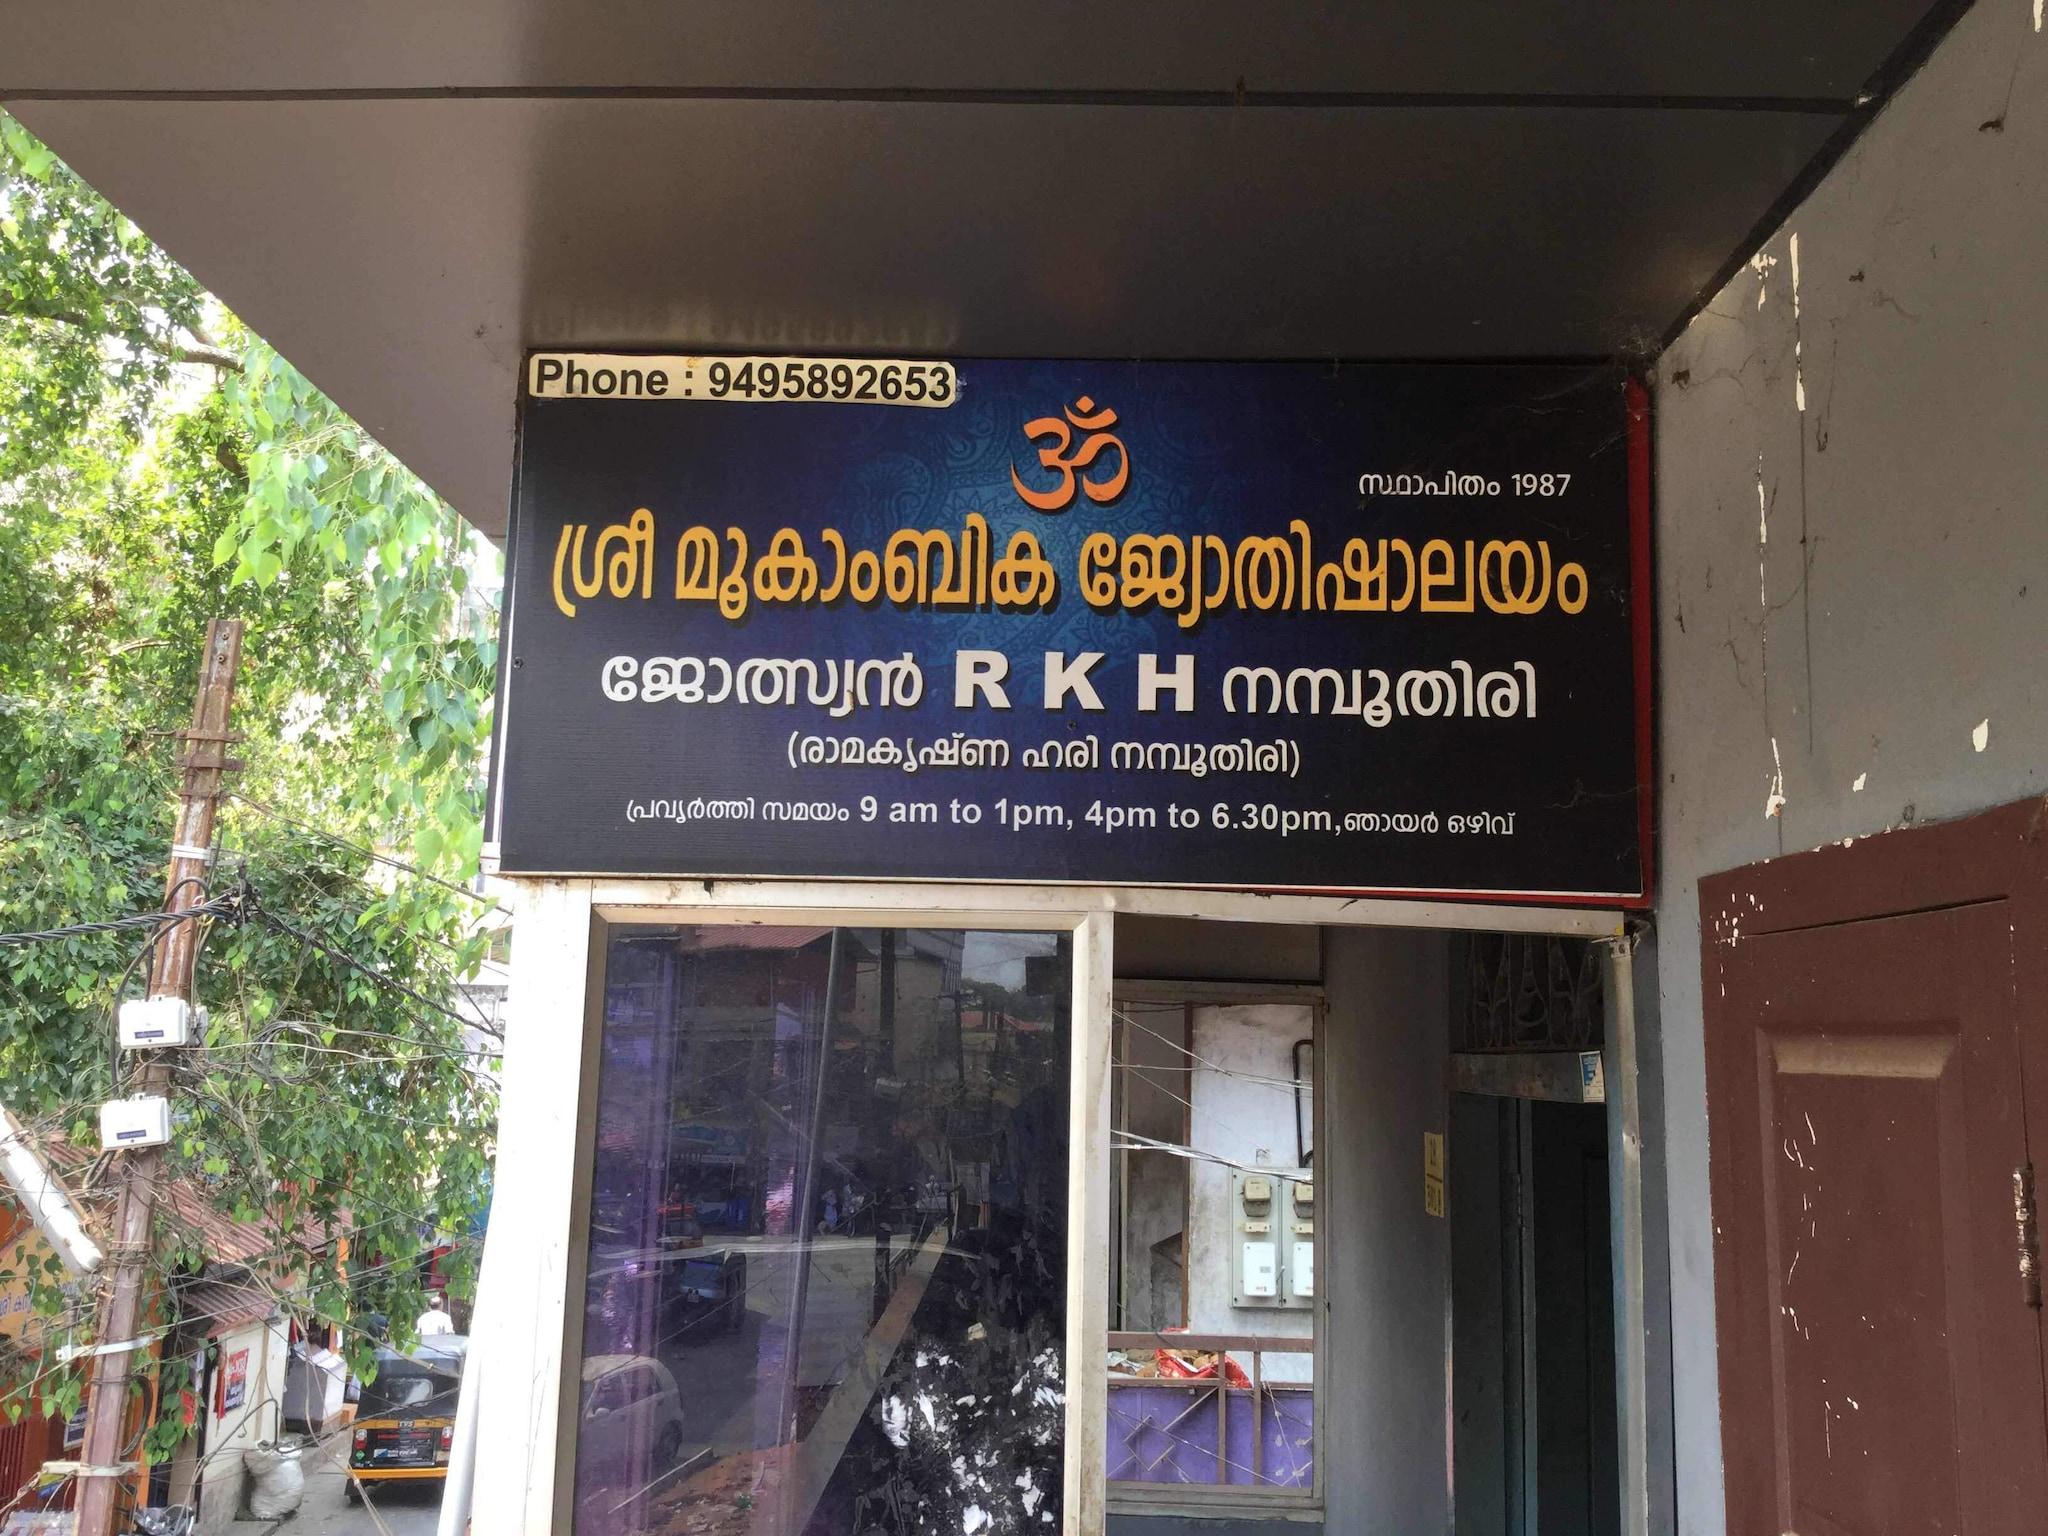 Top 50 Astrologers in Kozhikode - Famous Astrologers - Justdial